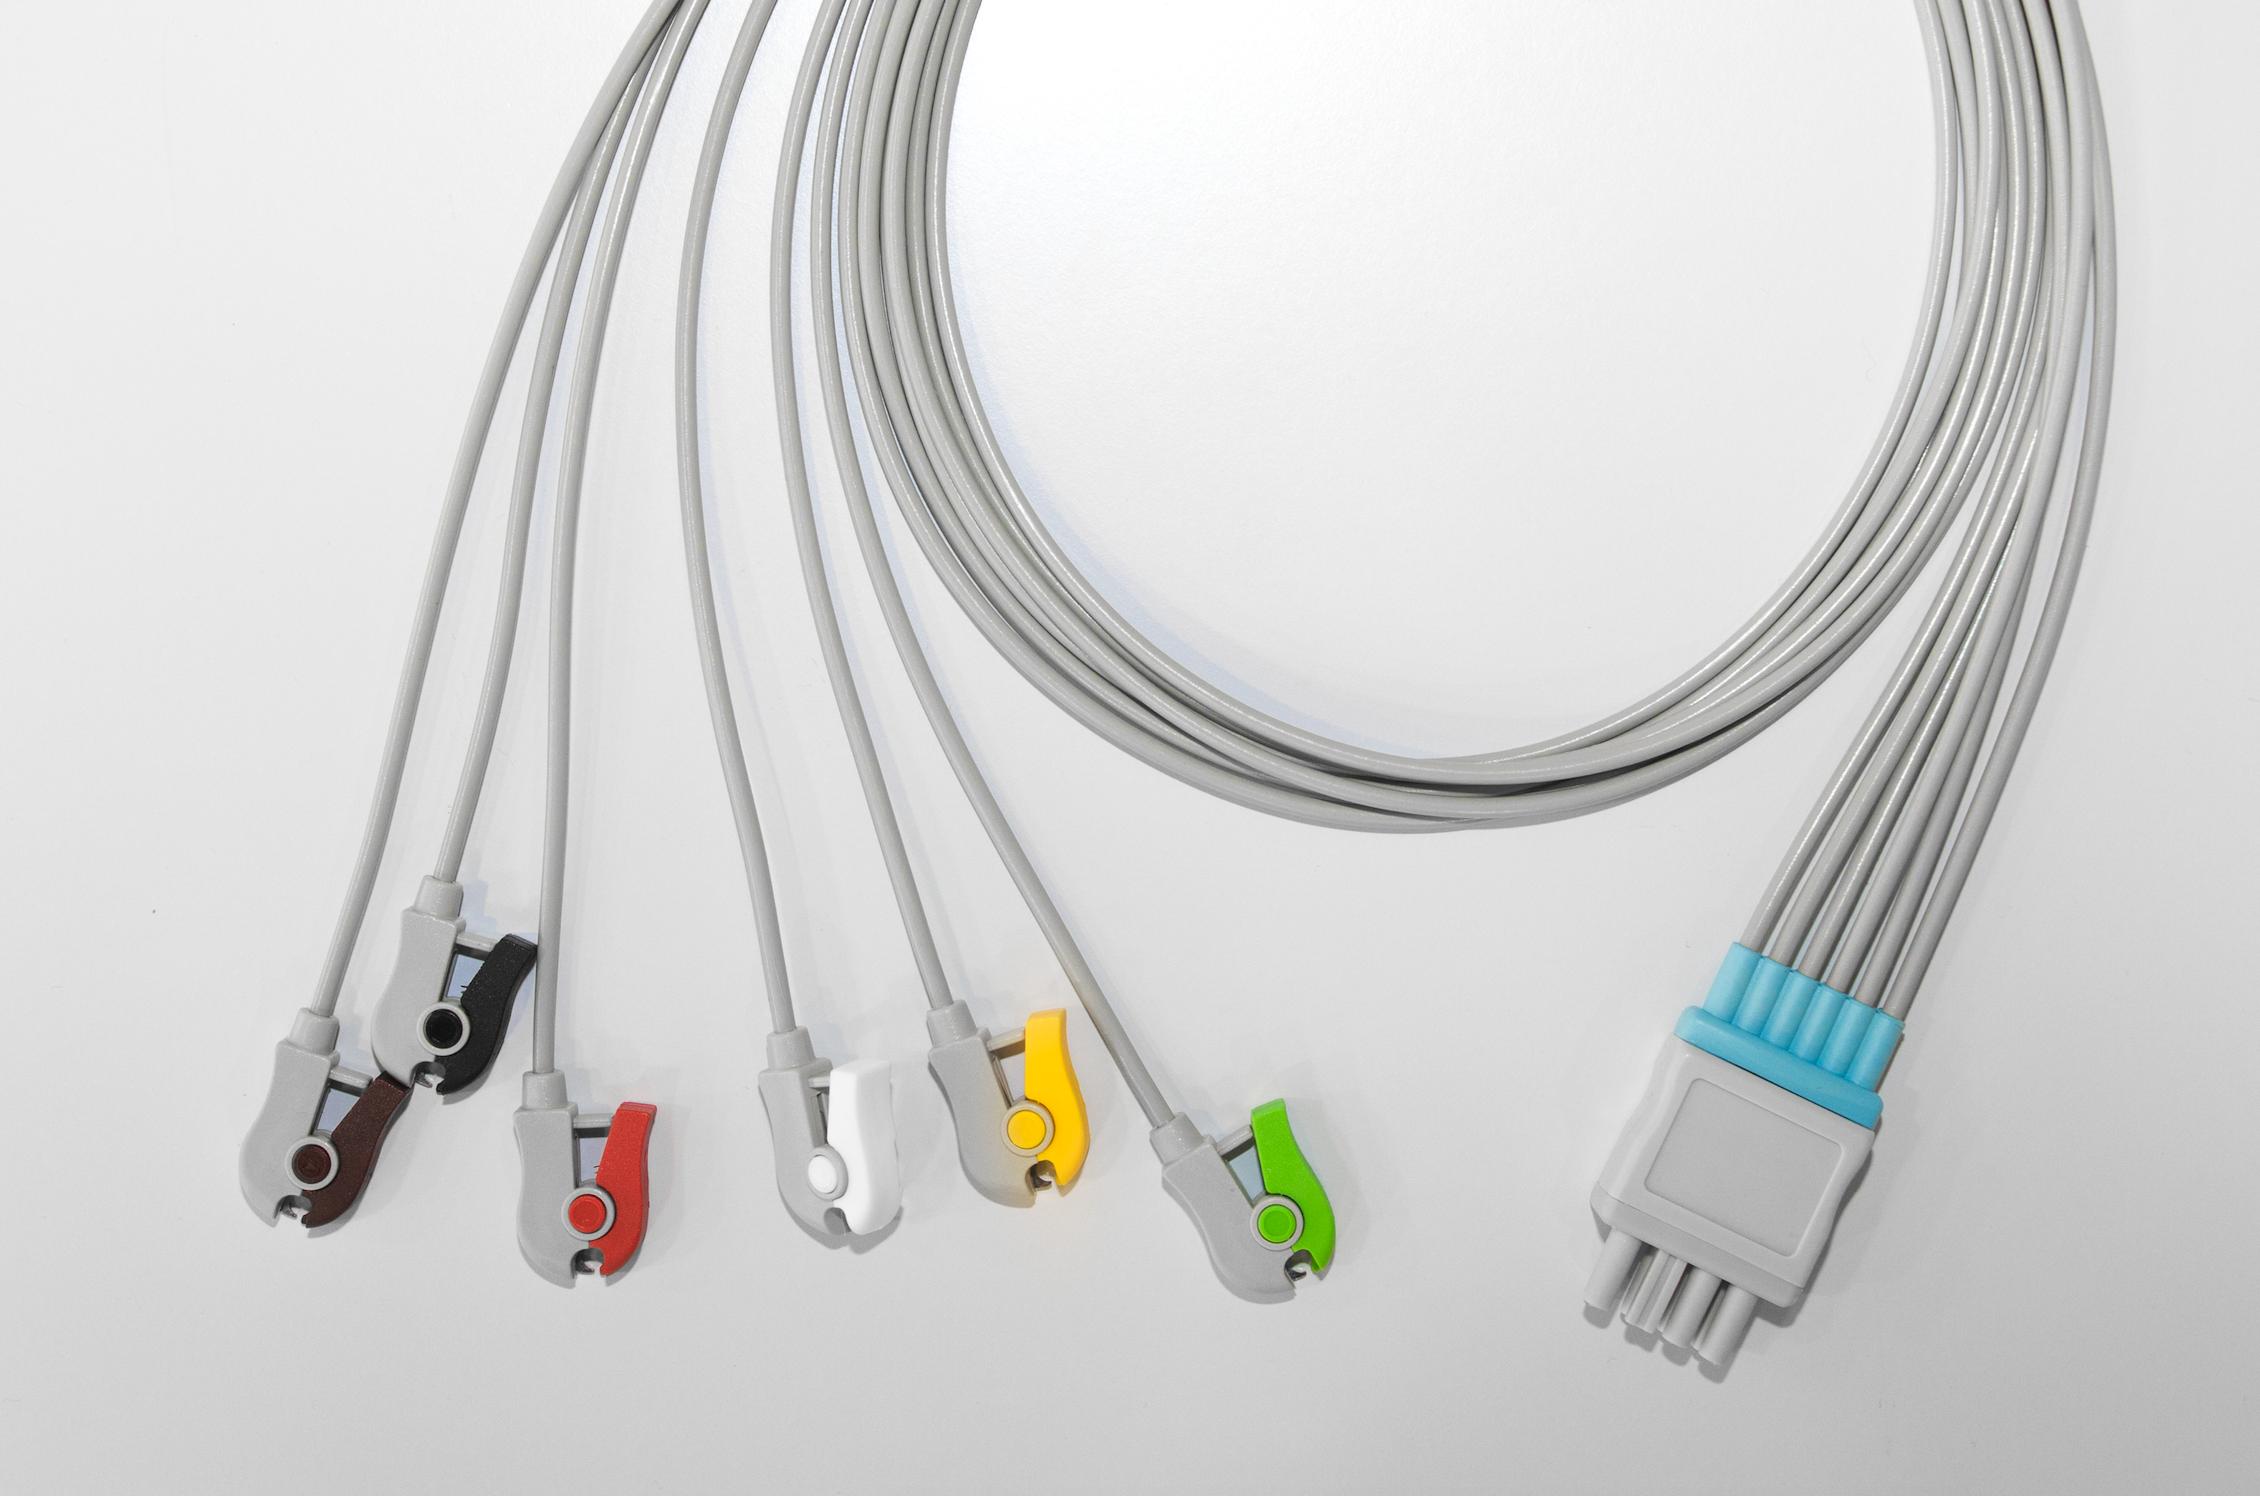 EKG Kabelsysteme und Elektroden | Leuag AG